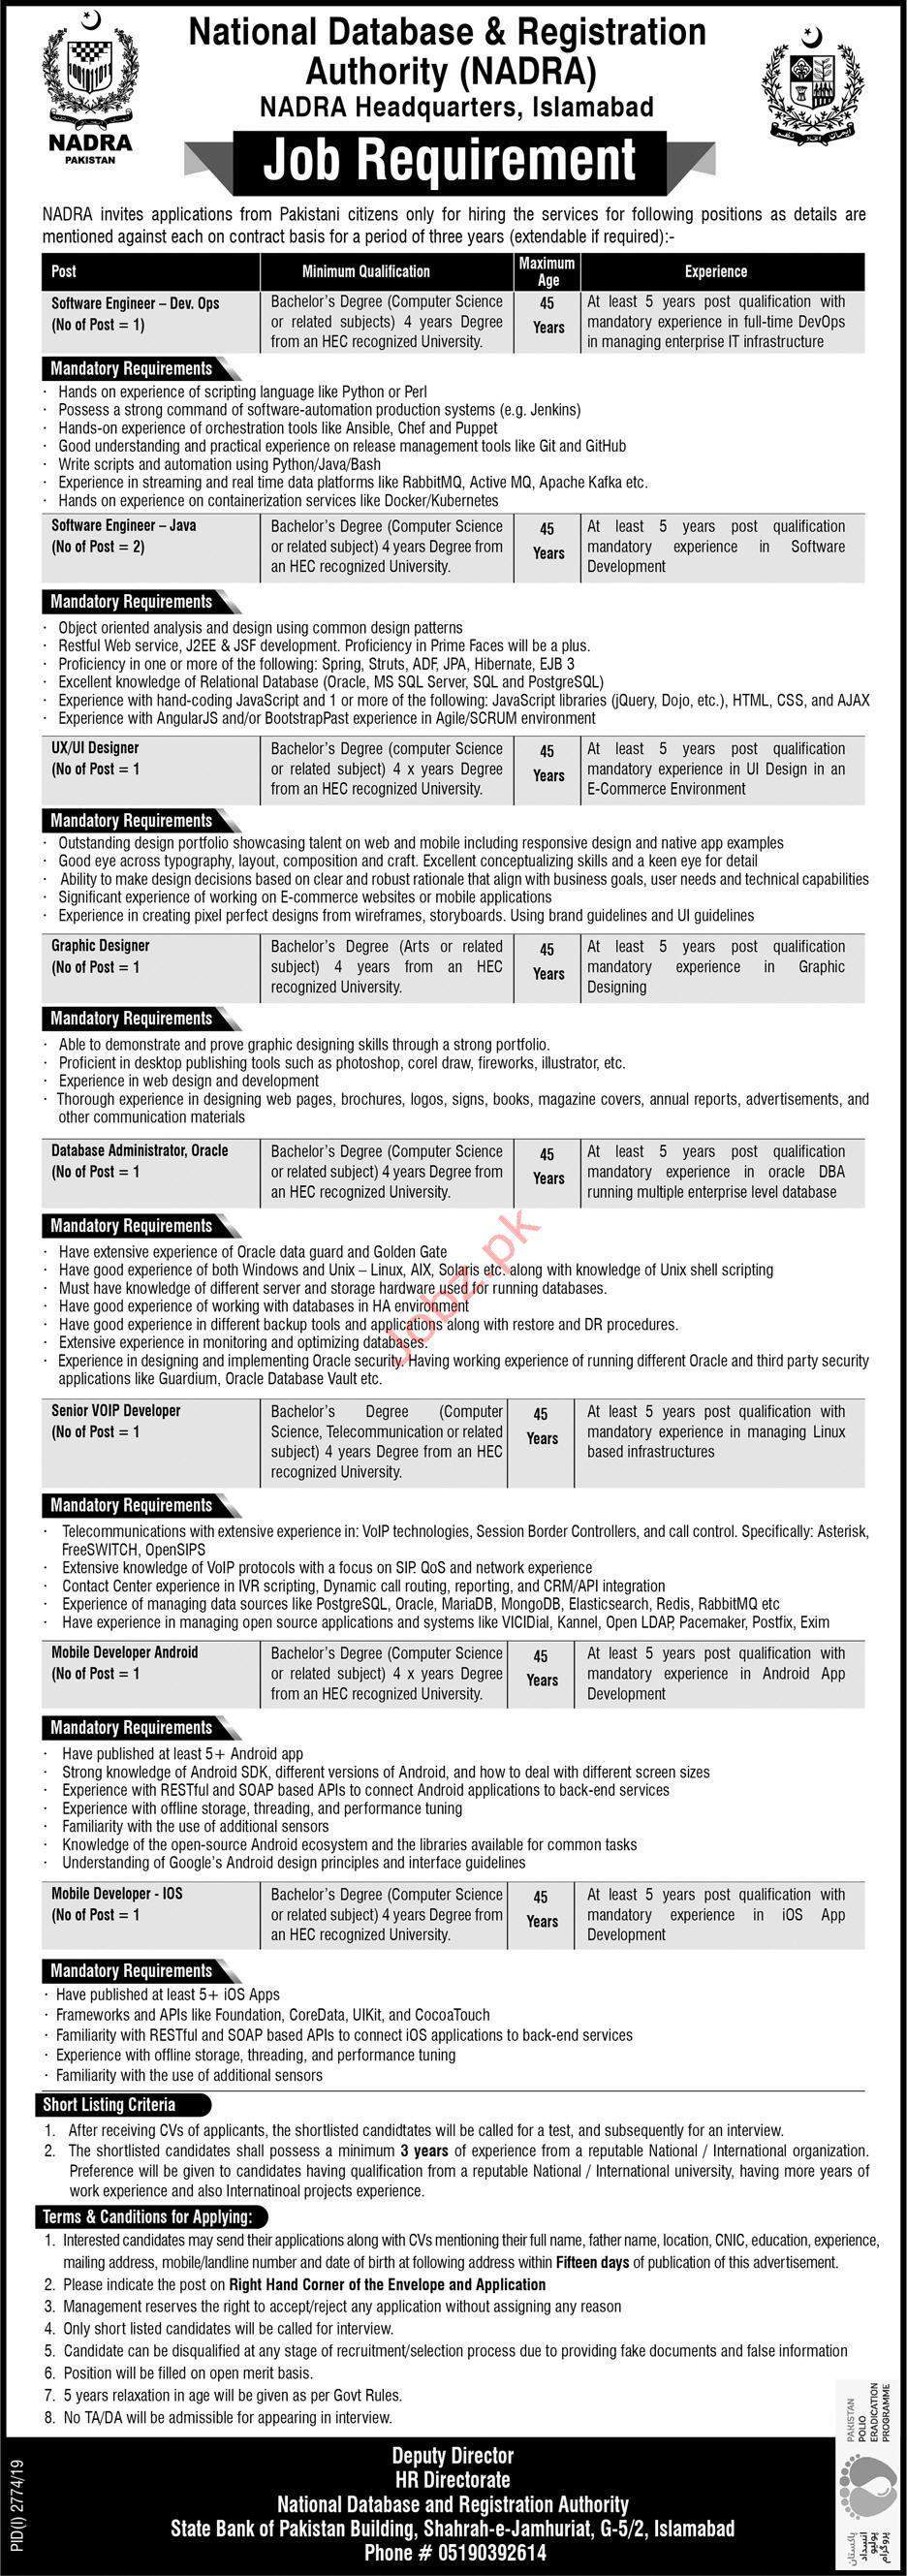 NADRA National Database & Registration Authority Jobs